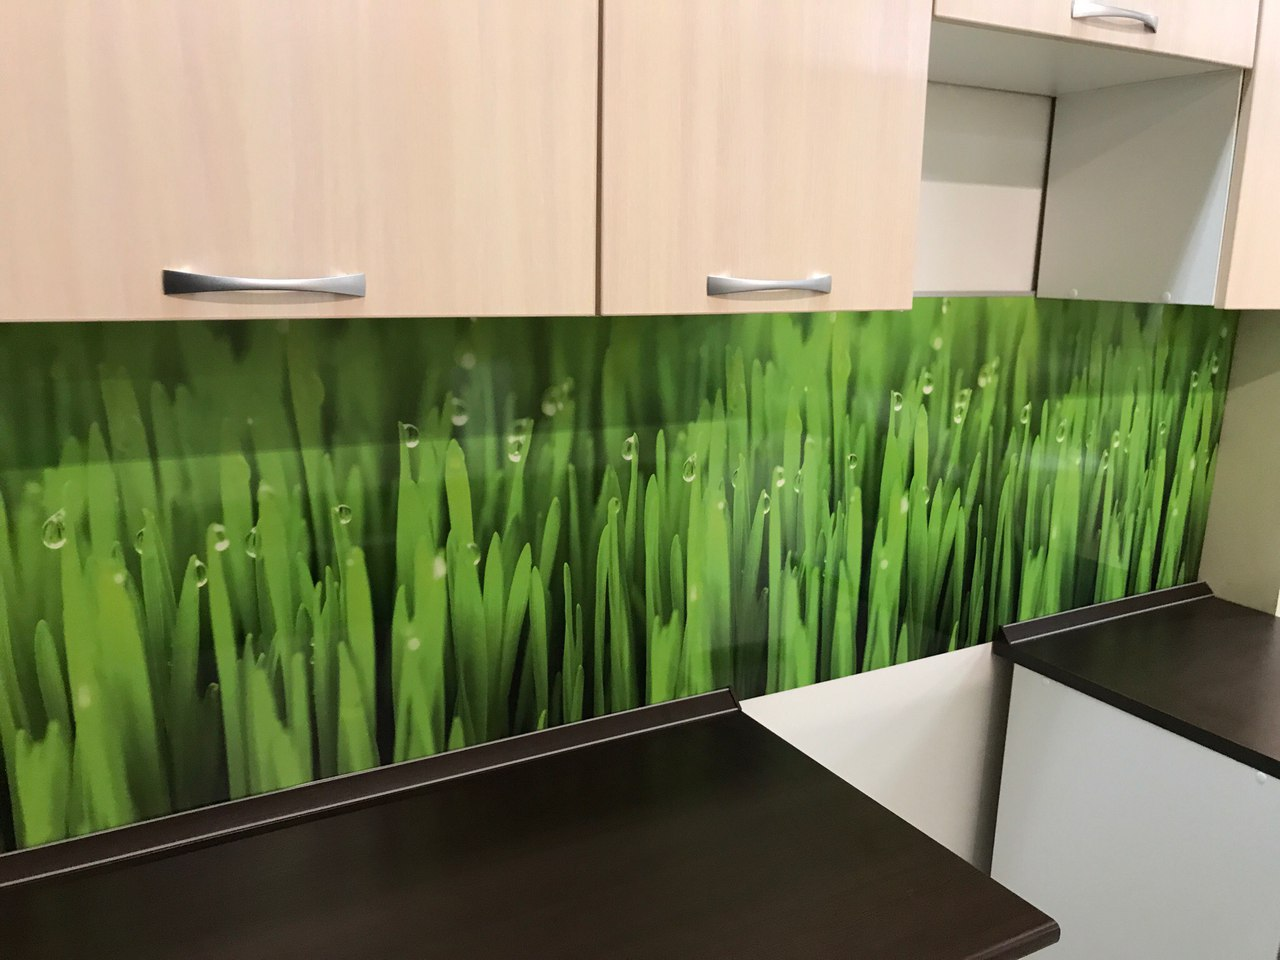 Картинки штор для кухни футболисты видят